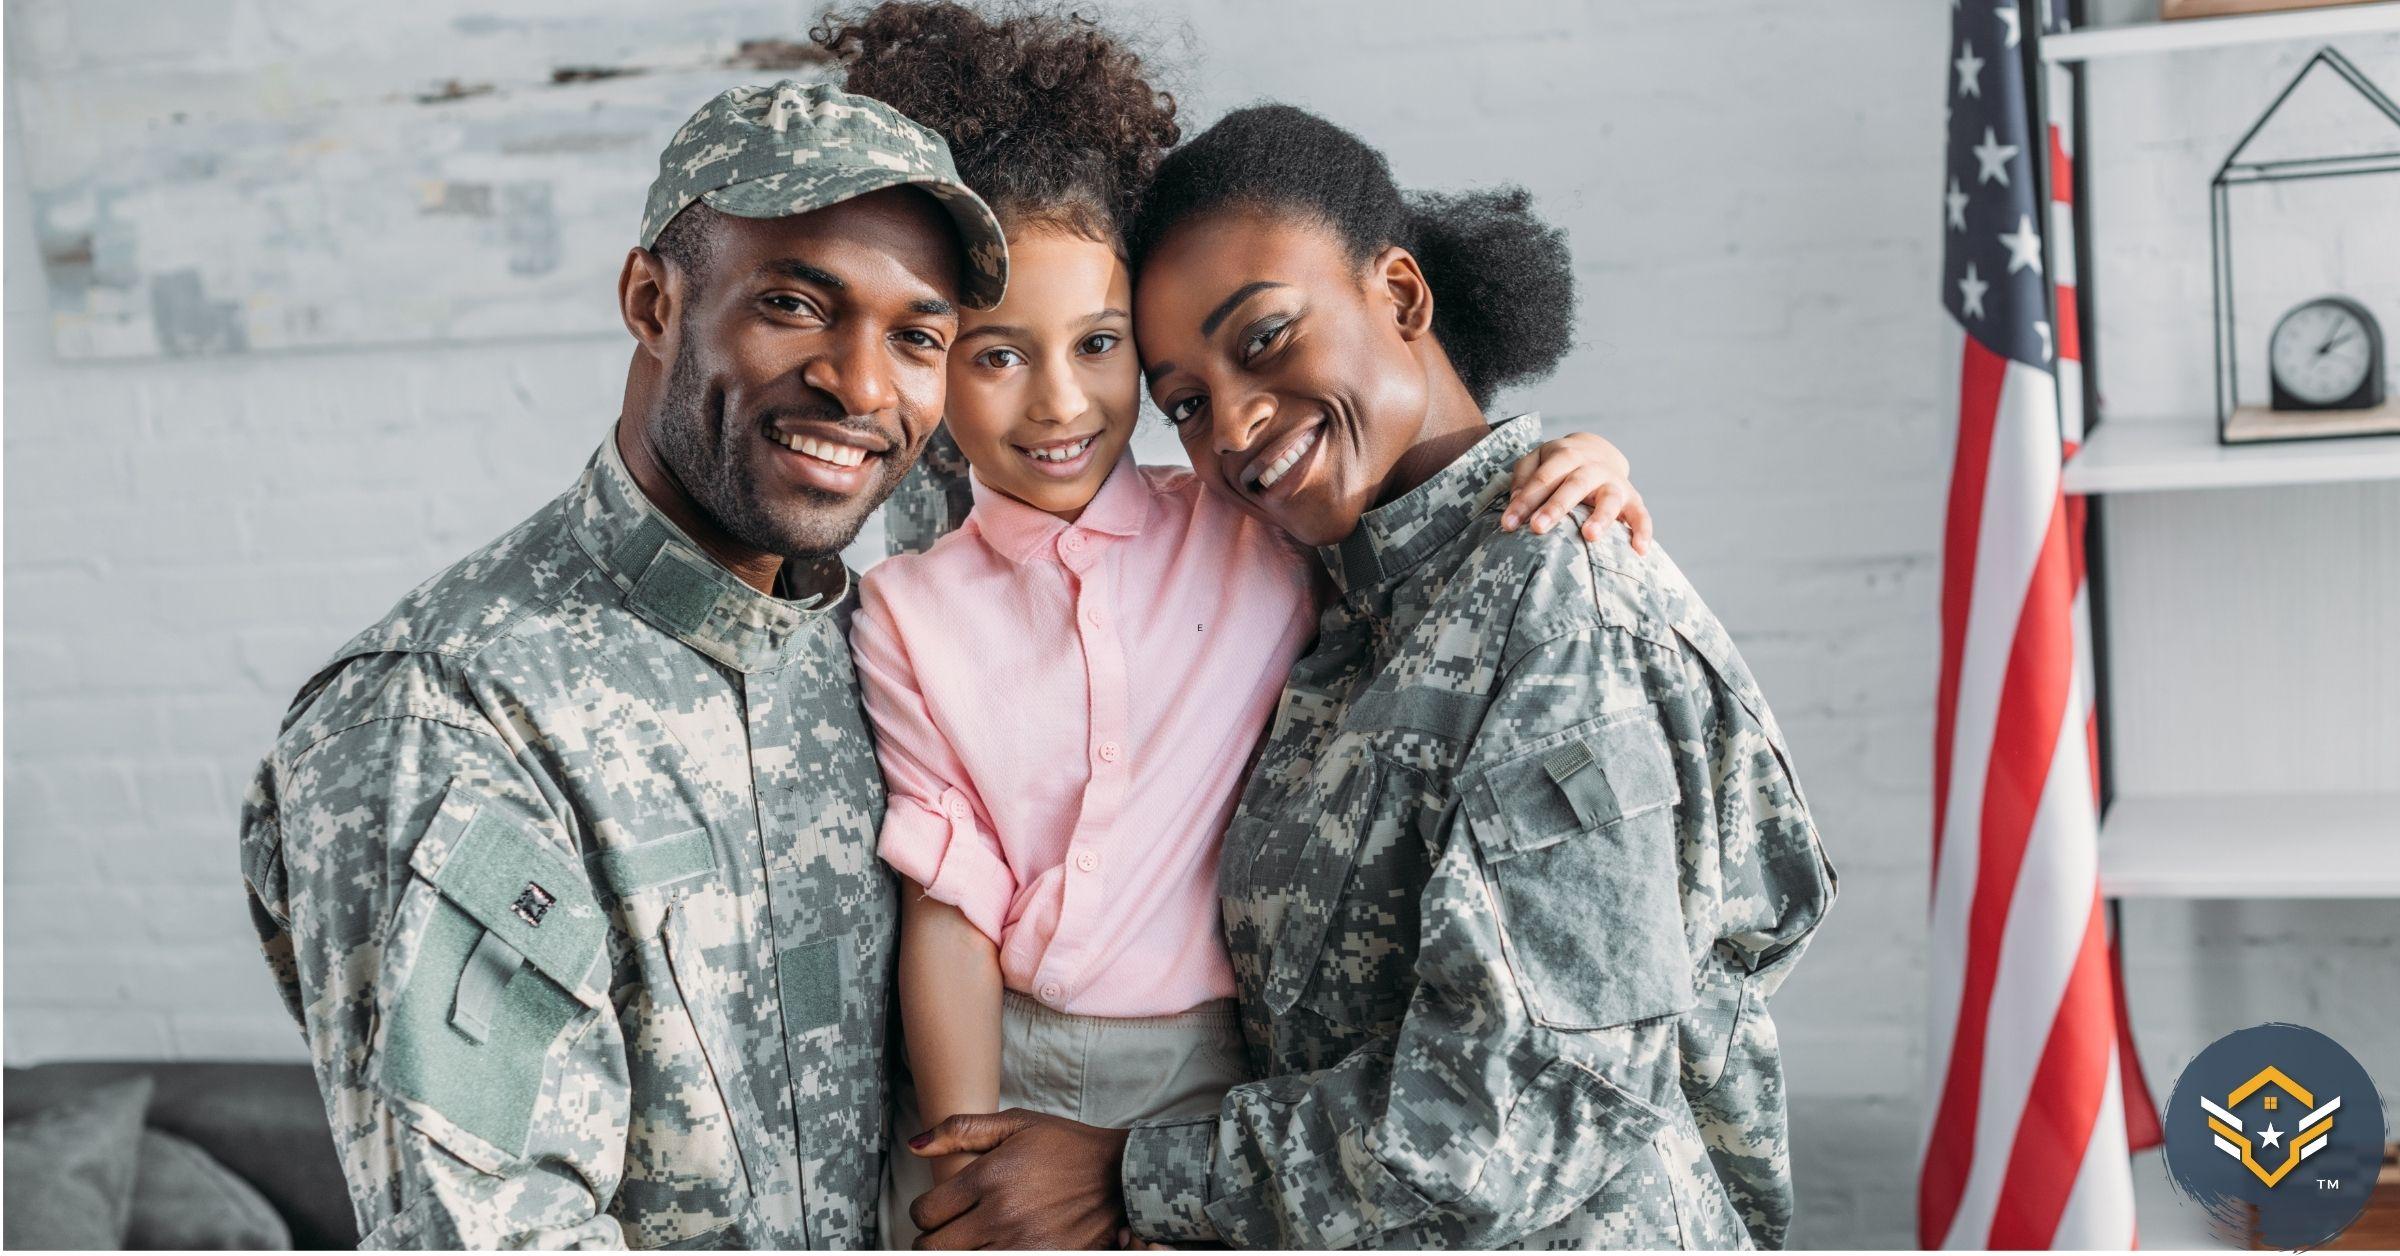 should military members buy homes?